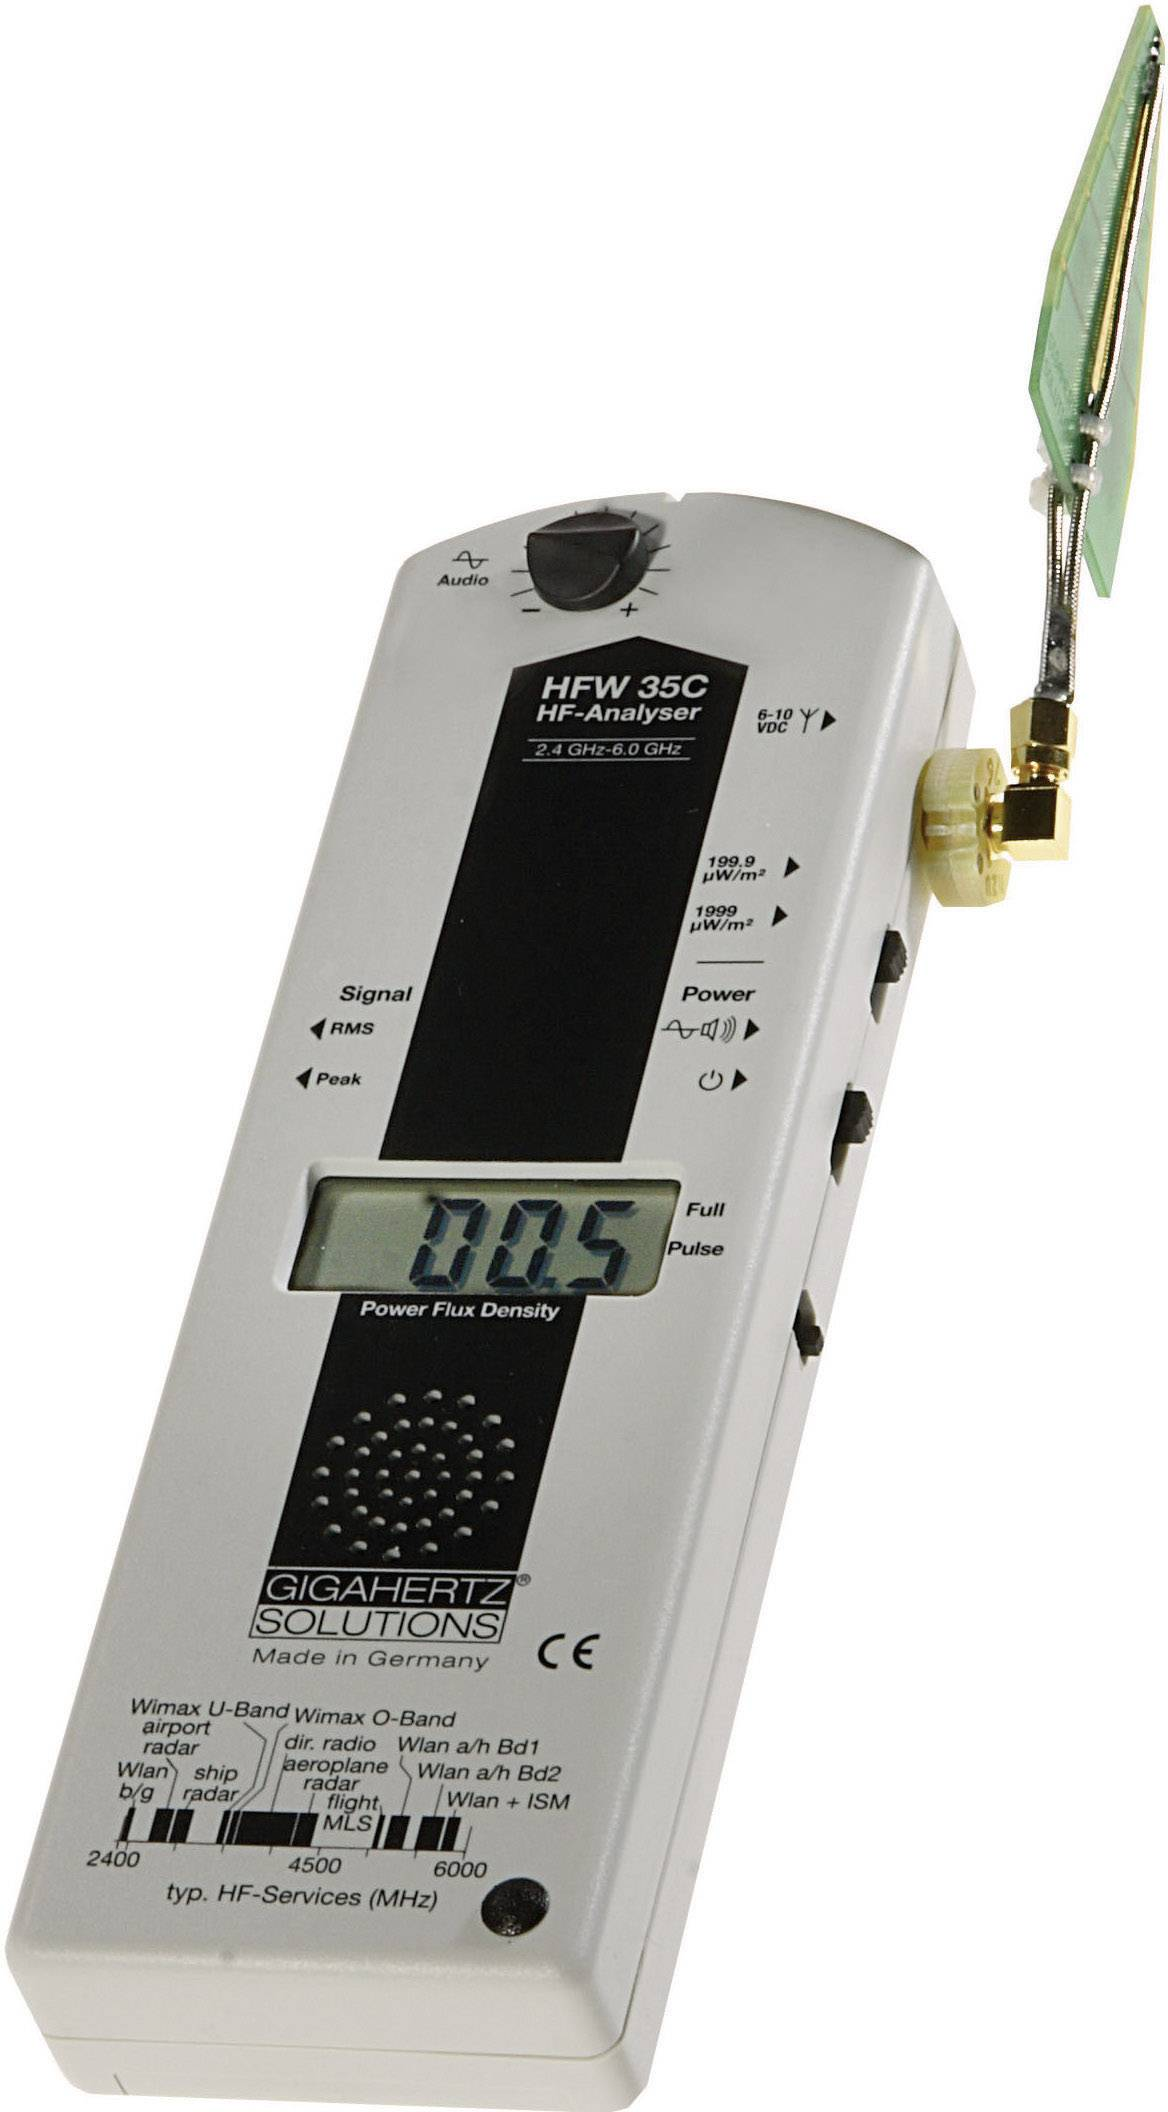 VF analyzátor Gigahertz Solutions HFW 35C pro měření elektrosmogu, 2,4 - 6 GHz